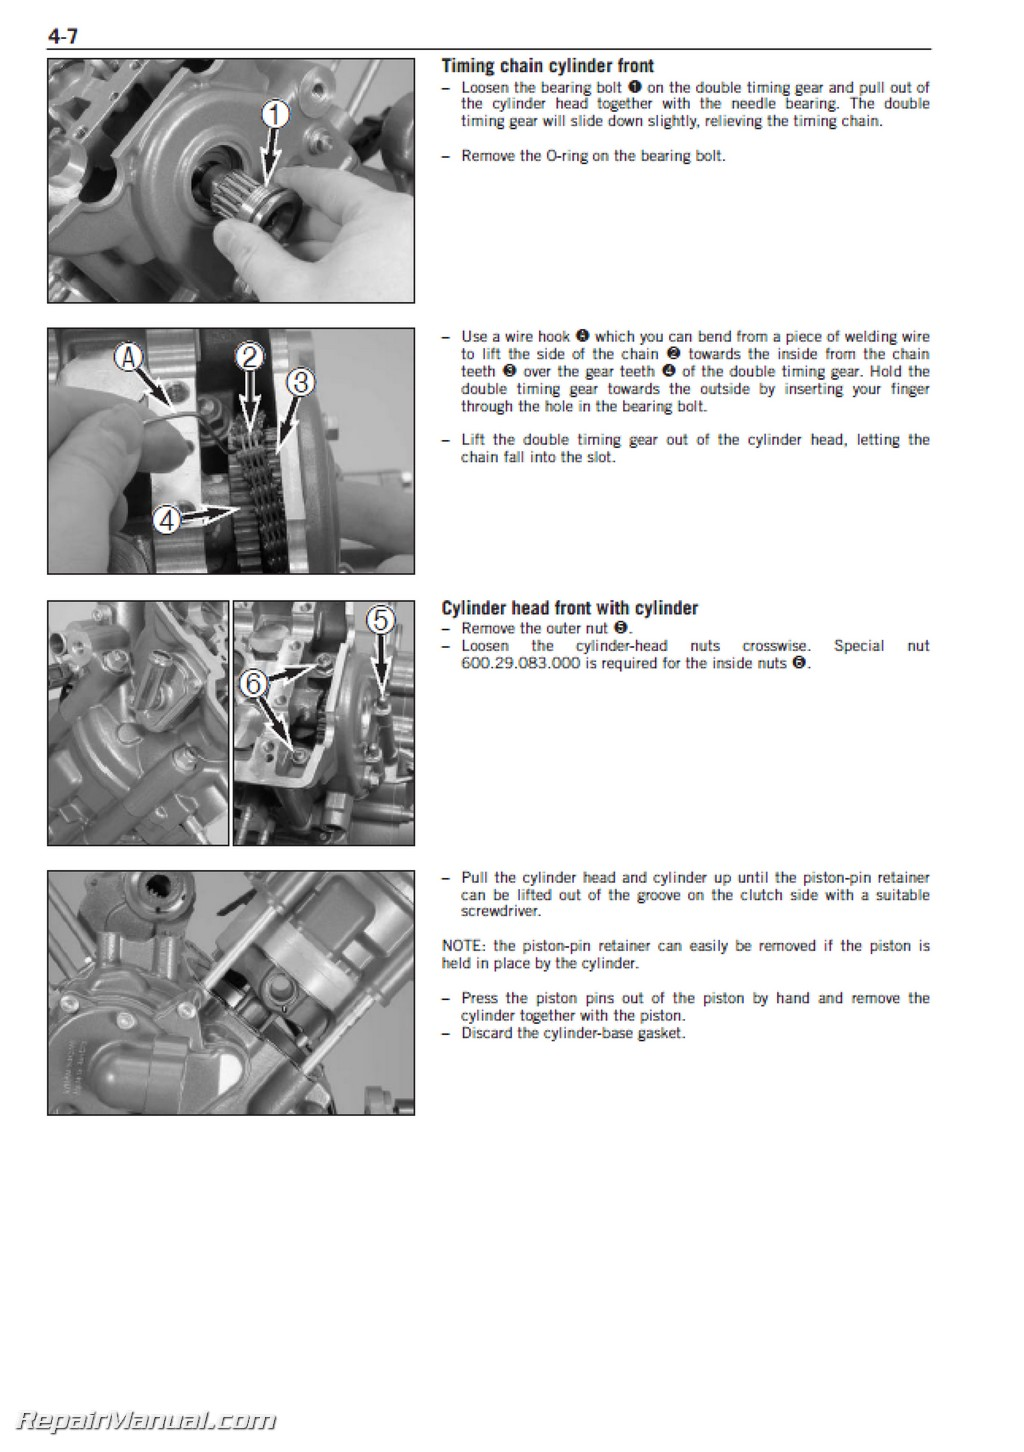 2003 2007 ktm lc8 950 990 v twin motorcycle engine repair manual 2003 2007 ktm lc8 950 990 v twin motorcycle engine repair manual page 2